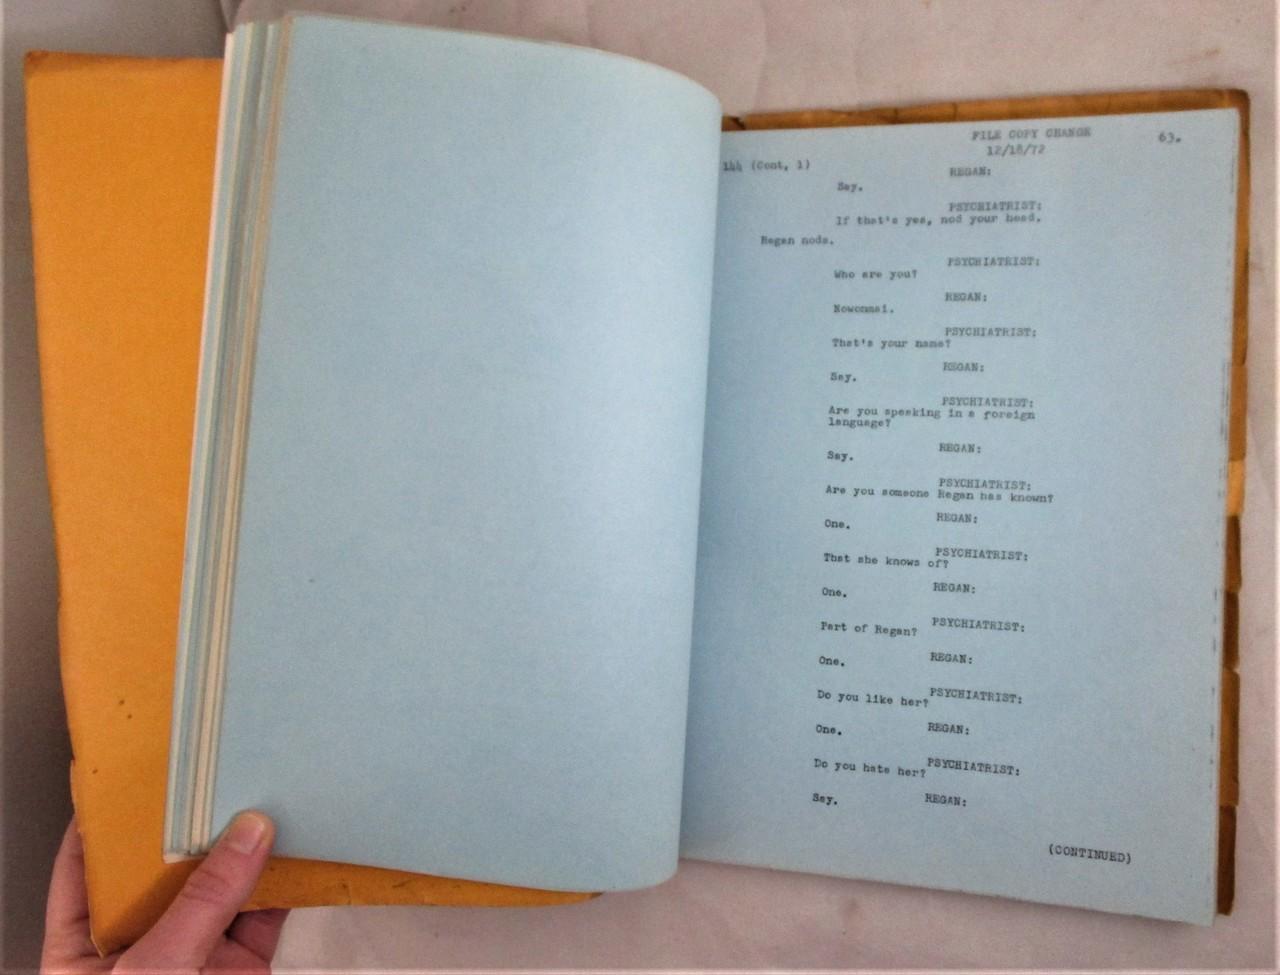 THE EXORCIST, by Wm P Blatty - 1972 [Original Warner Bros Script]